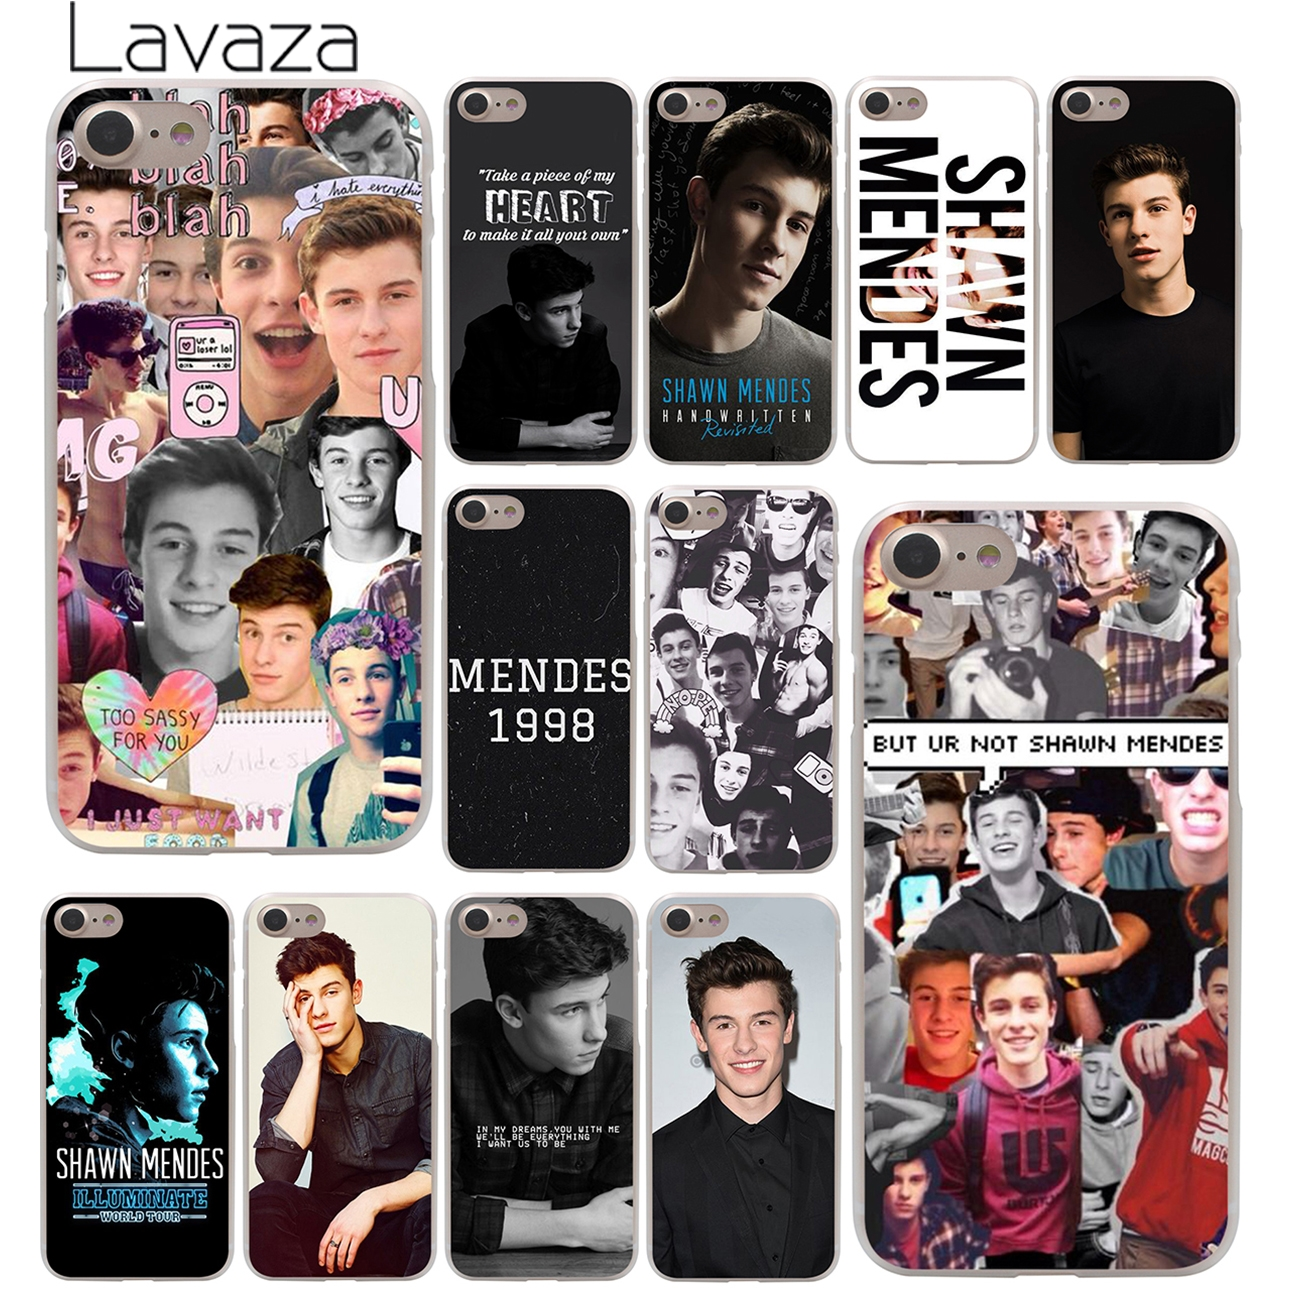 Shawn Mendes Magcon Hard Case Transparent for iPhone 7 7 Plus 6 6s Plus 5 5S SE 5C 4 4S